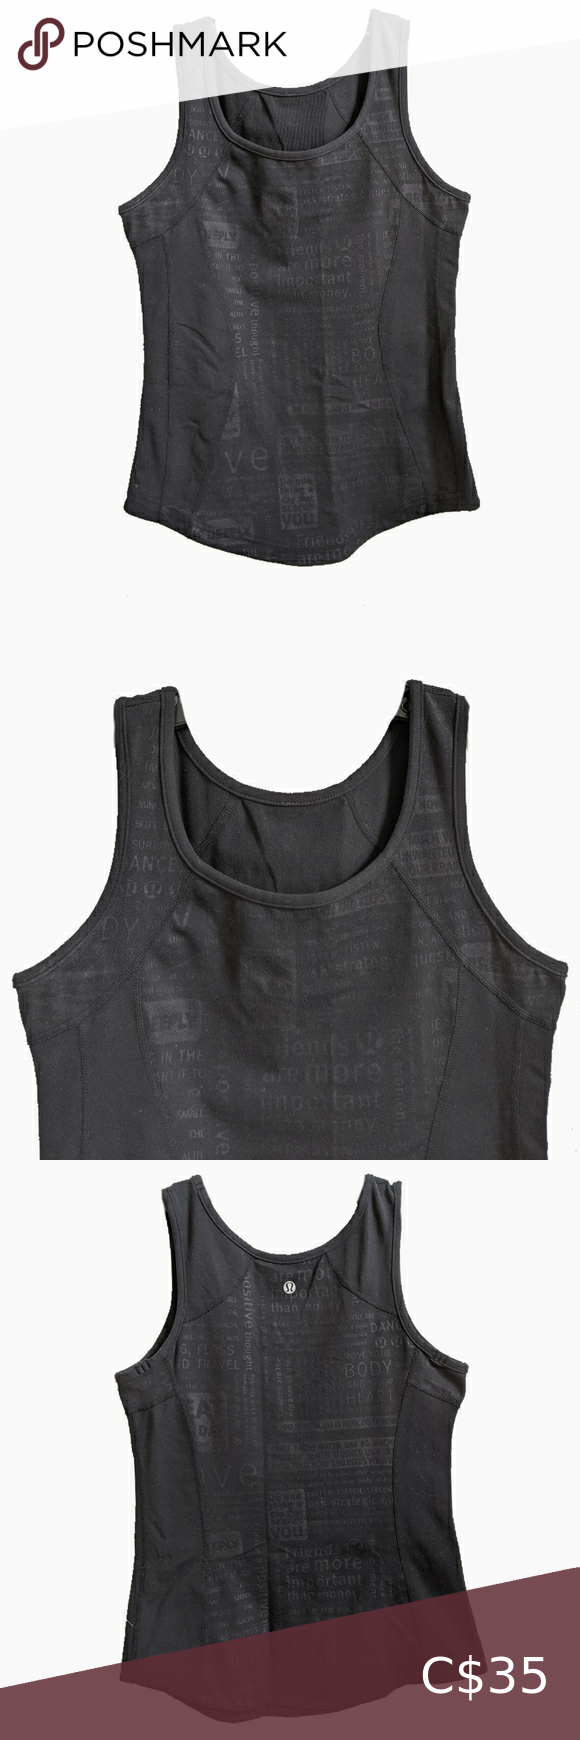 Lululemon Athletica Black Tank Top With Logo Black Tank Tops Tops Tank Tops